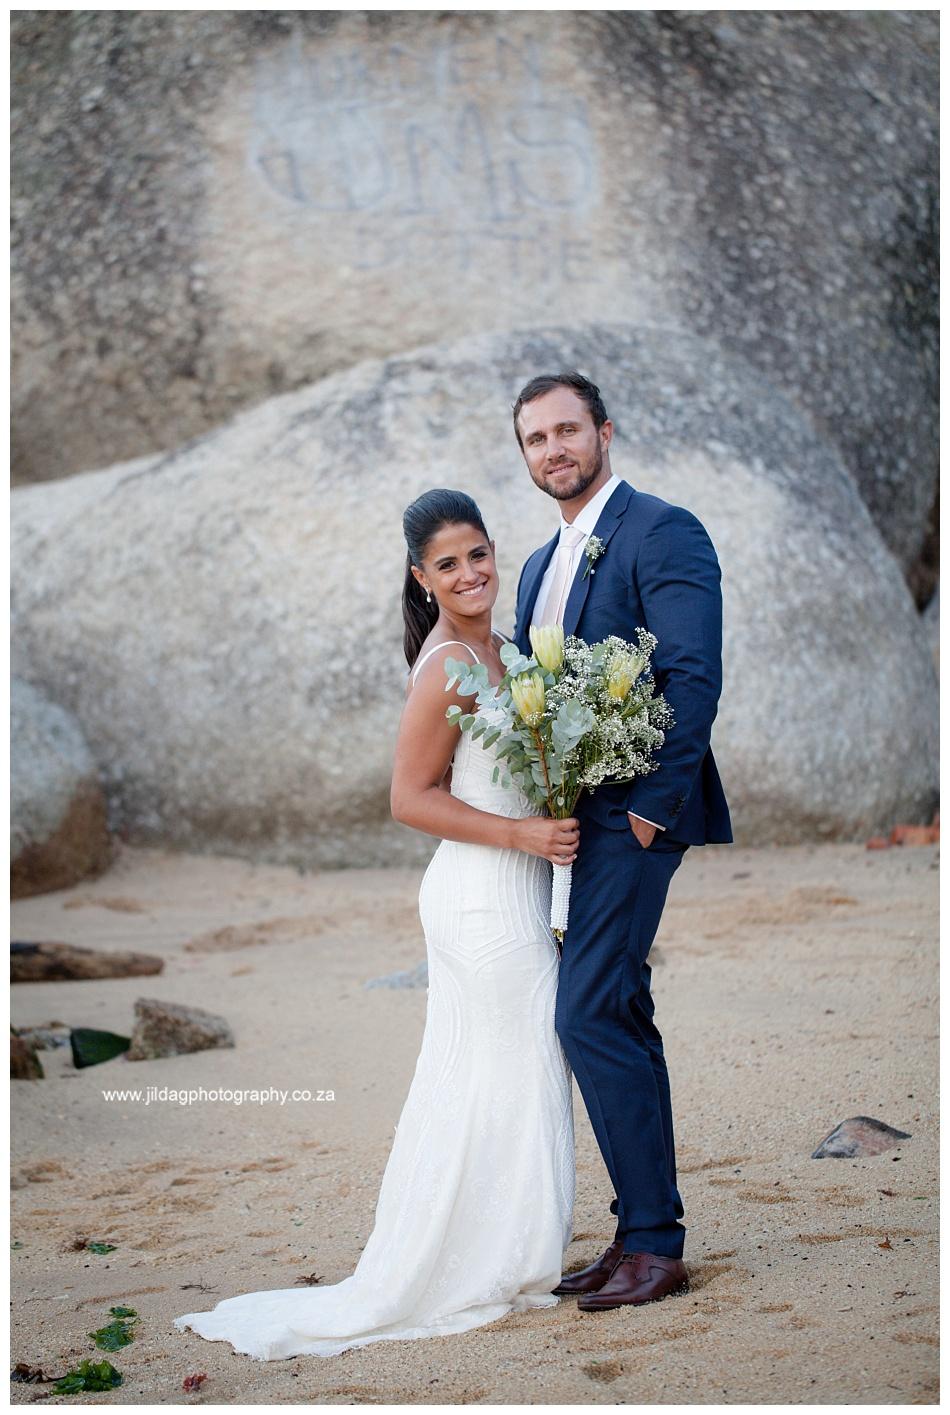 Jilda-G-Photography-12-Apostles-wedding_1769